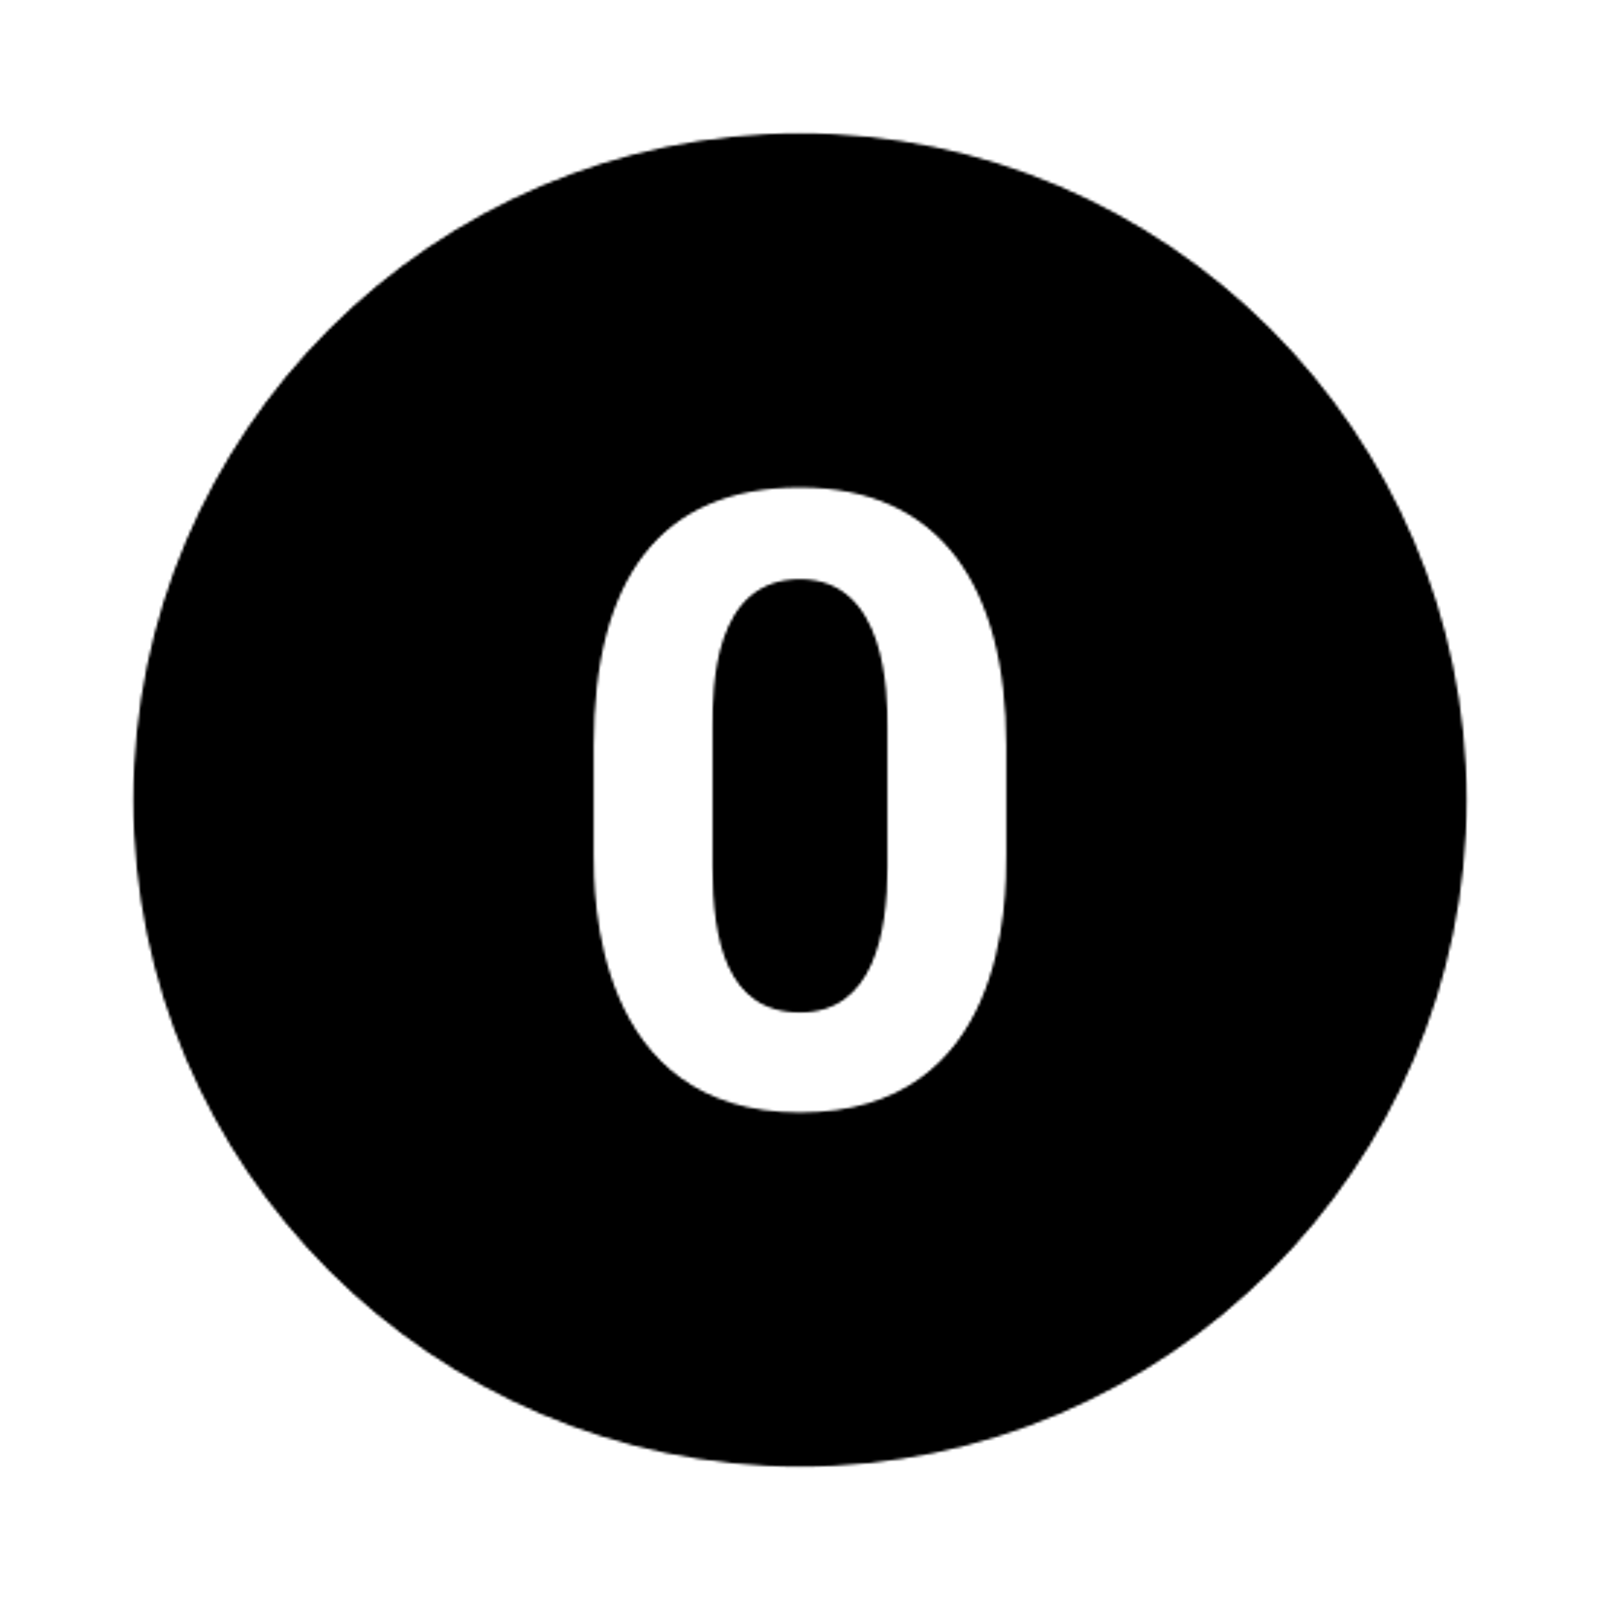 0 C w kółku icon